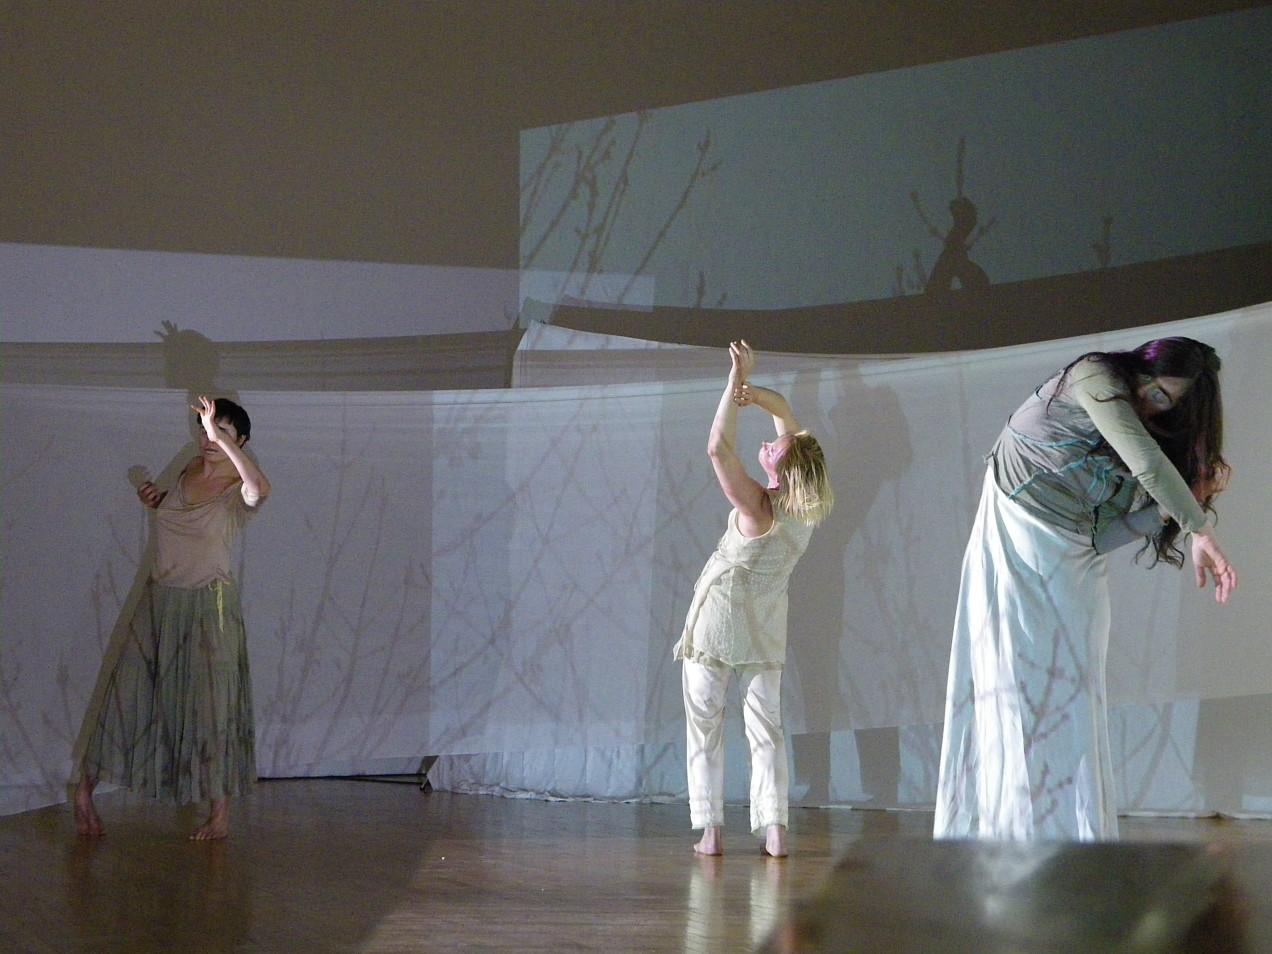 Mariam Ghani, Variations on a Haunted Wood, Erin Ellen Kelly, 2009, Queens Museum of Art